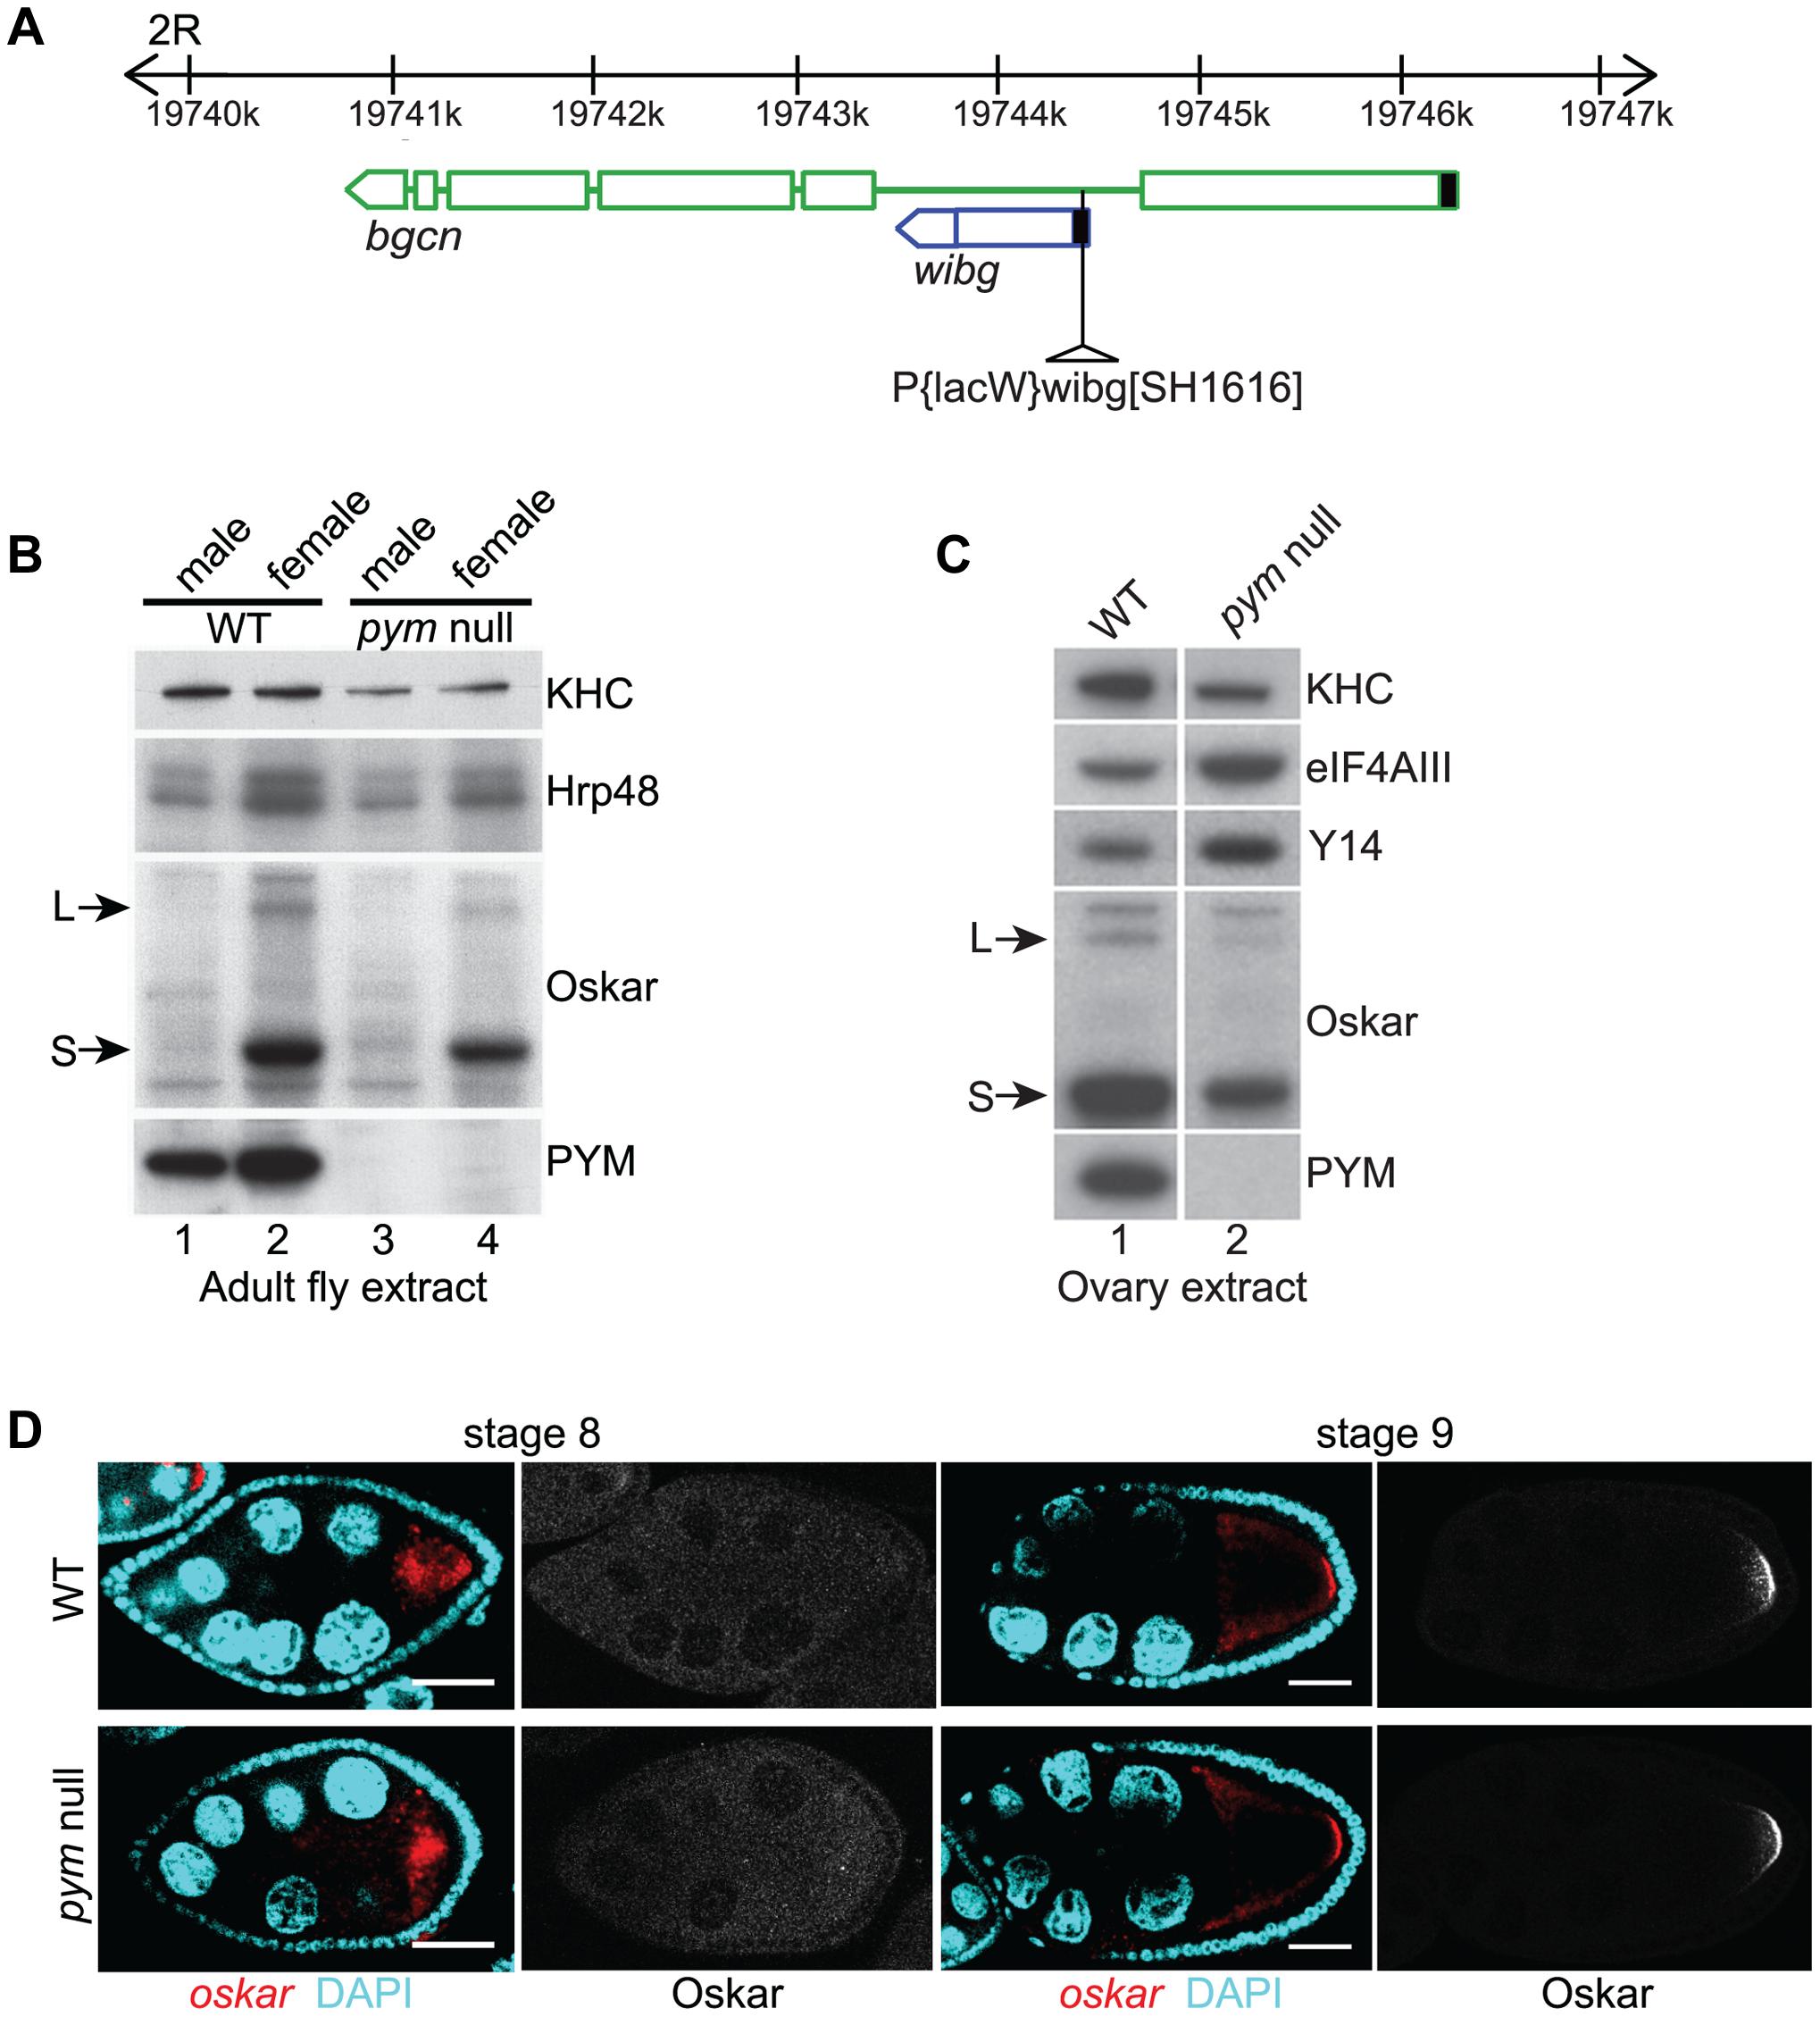 PYM is a non-essential gene in <i>Drosophila</i>.